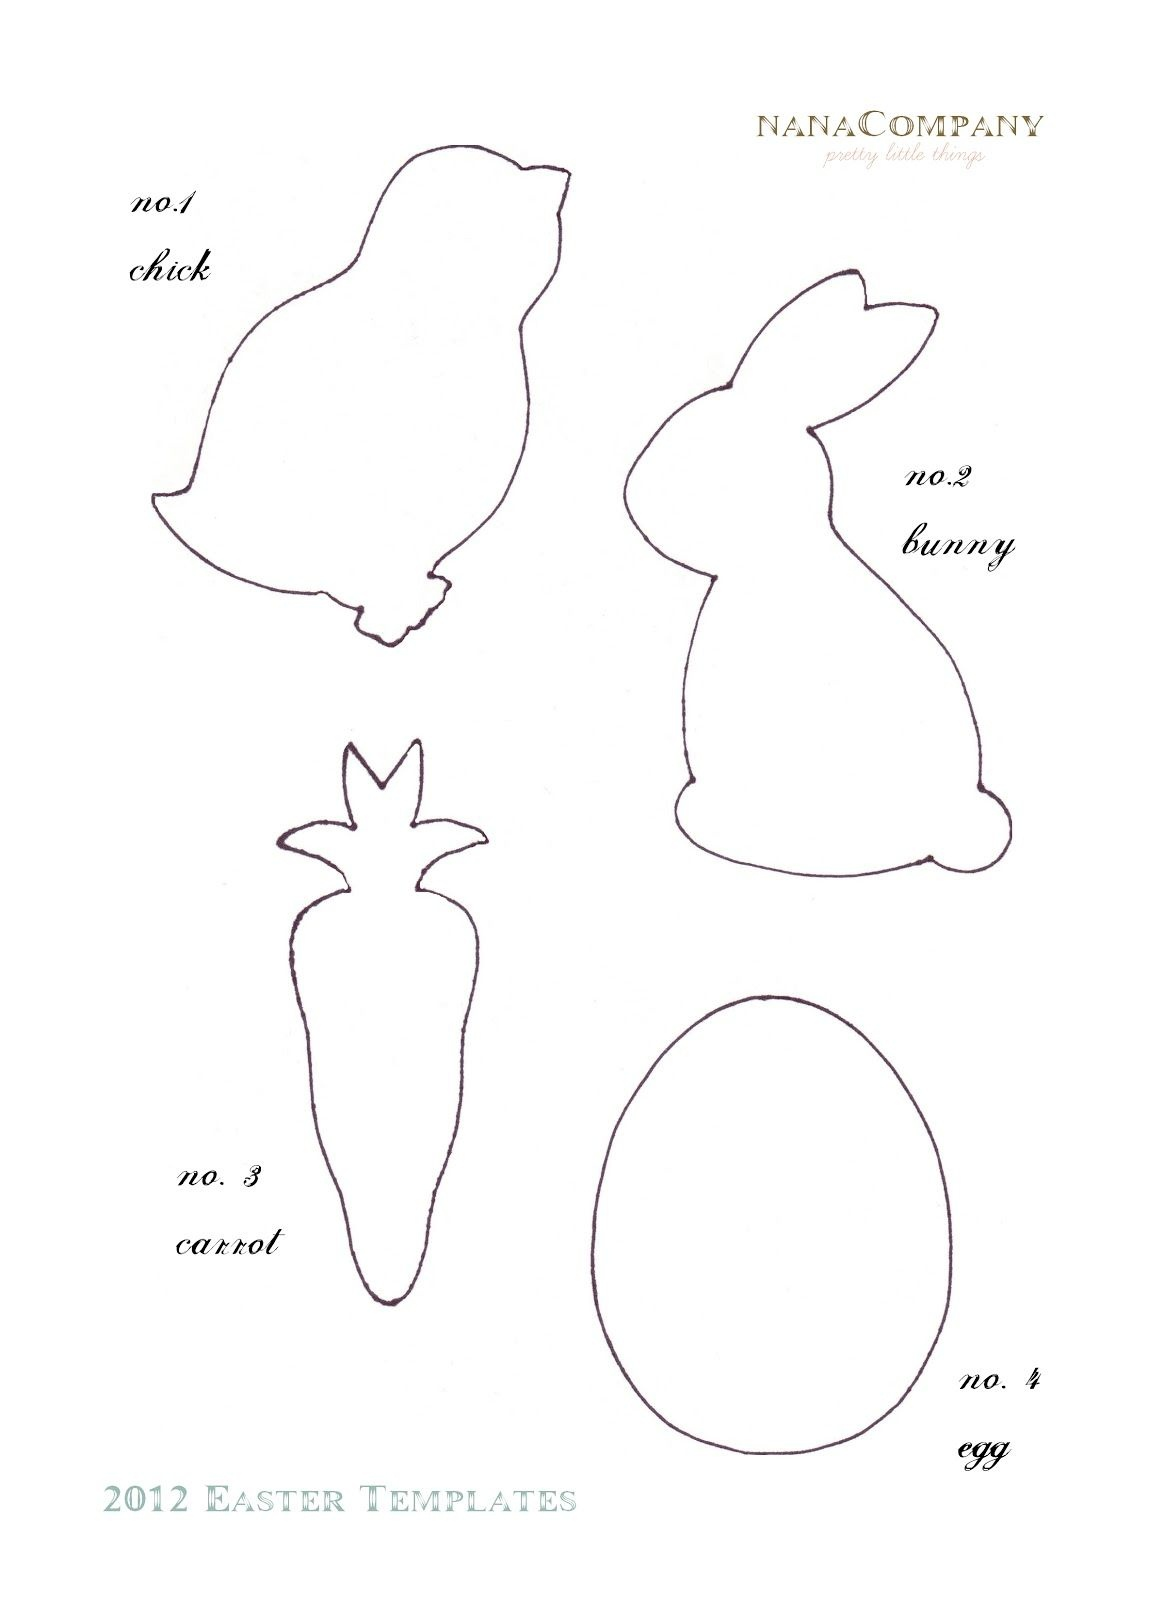 Felt Easter Patterns Free   Free+Printable+Easter+Template+For+ - Free Printable Easter Bunting